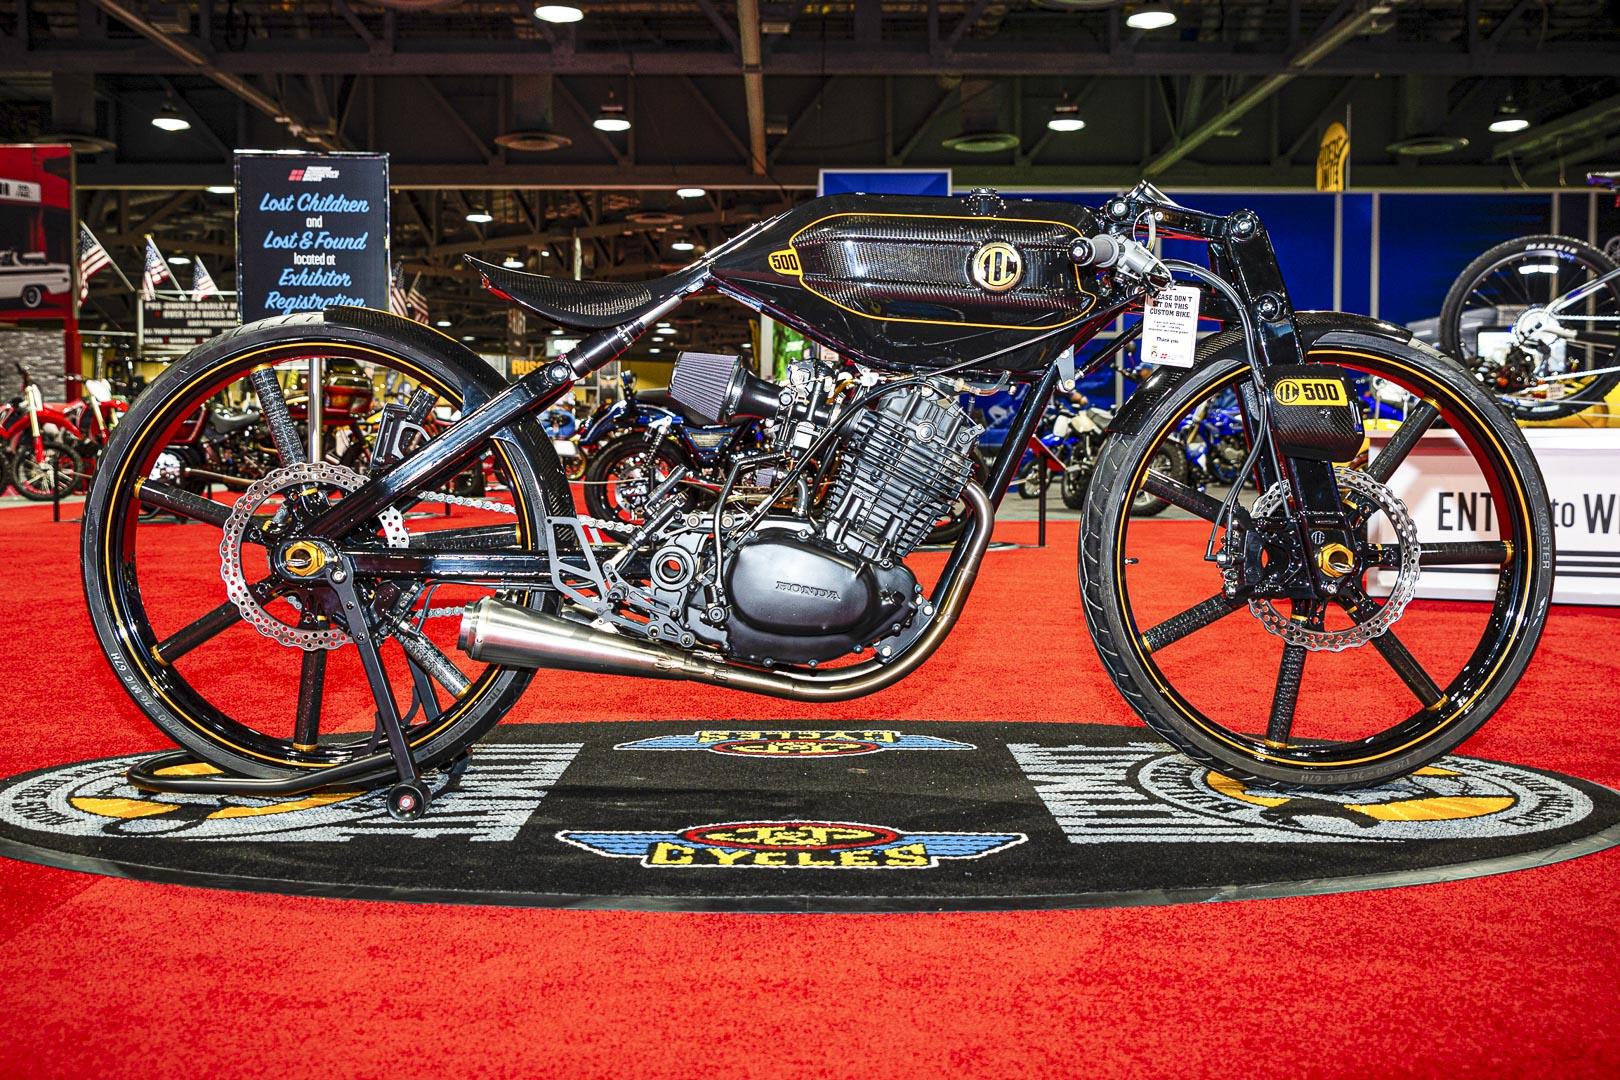 2019 Long Beach IMS A Bike Company